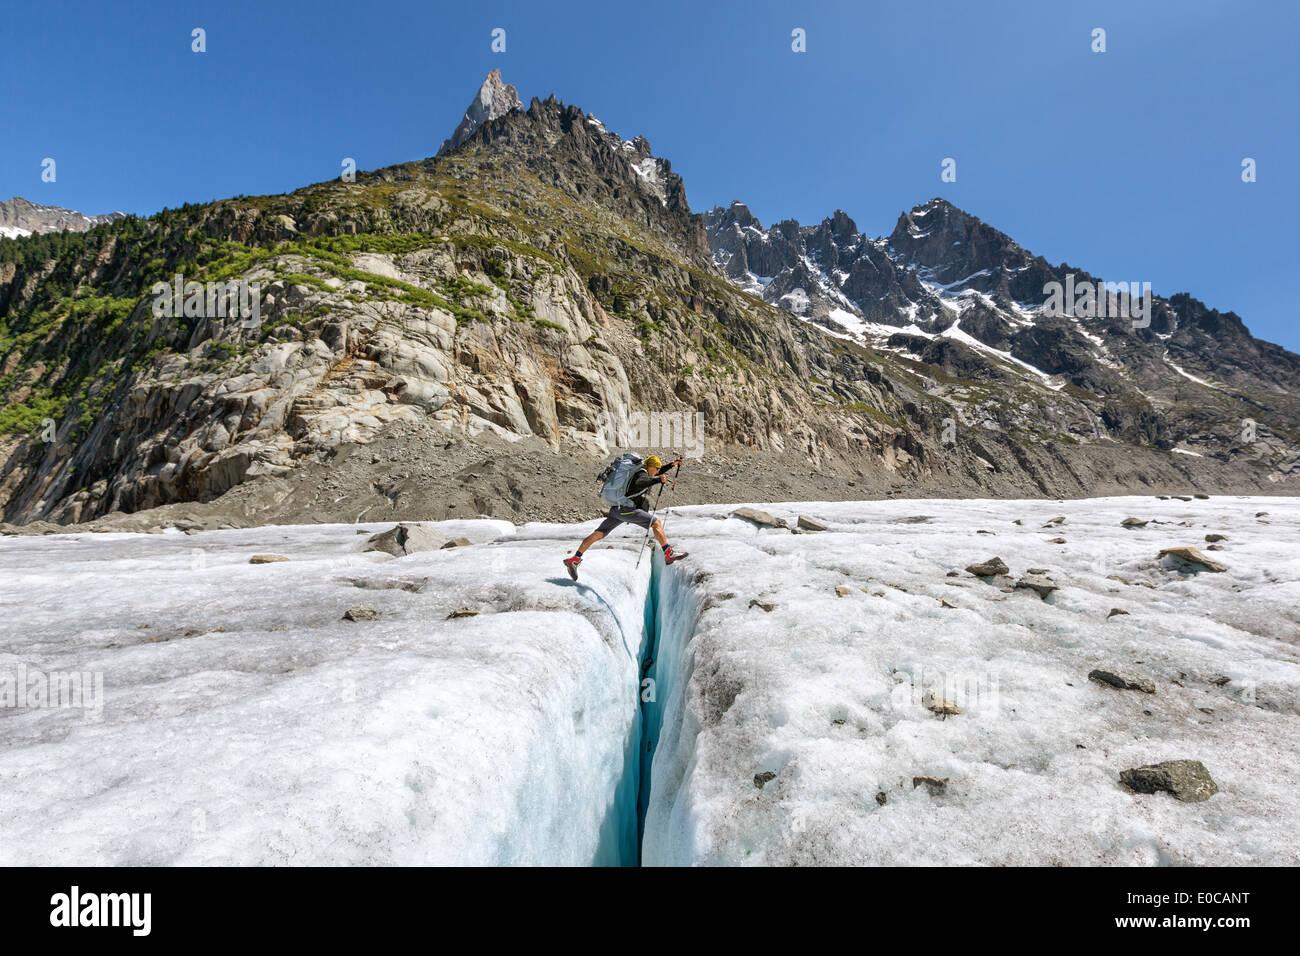 Leaping over crevasse at Mer de Glace glacier, Chamonix, Alps, France, EU - Stock Image